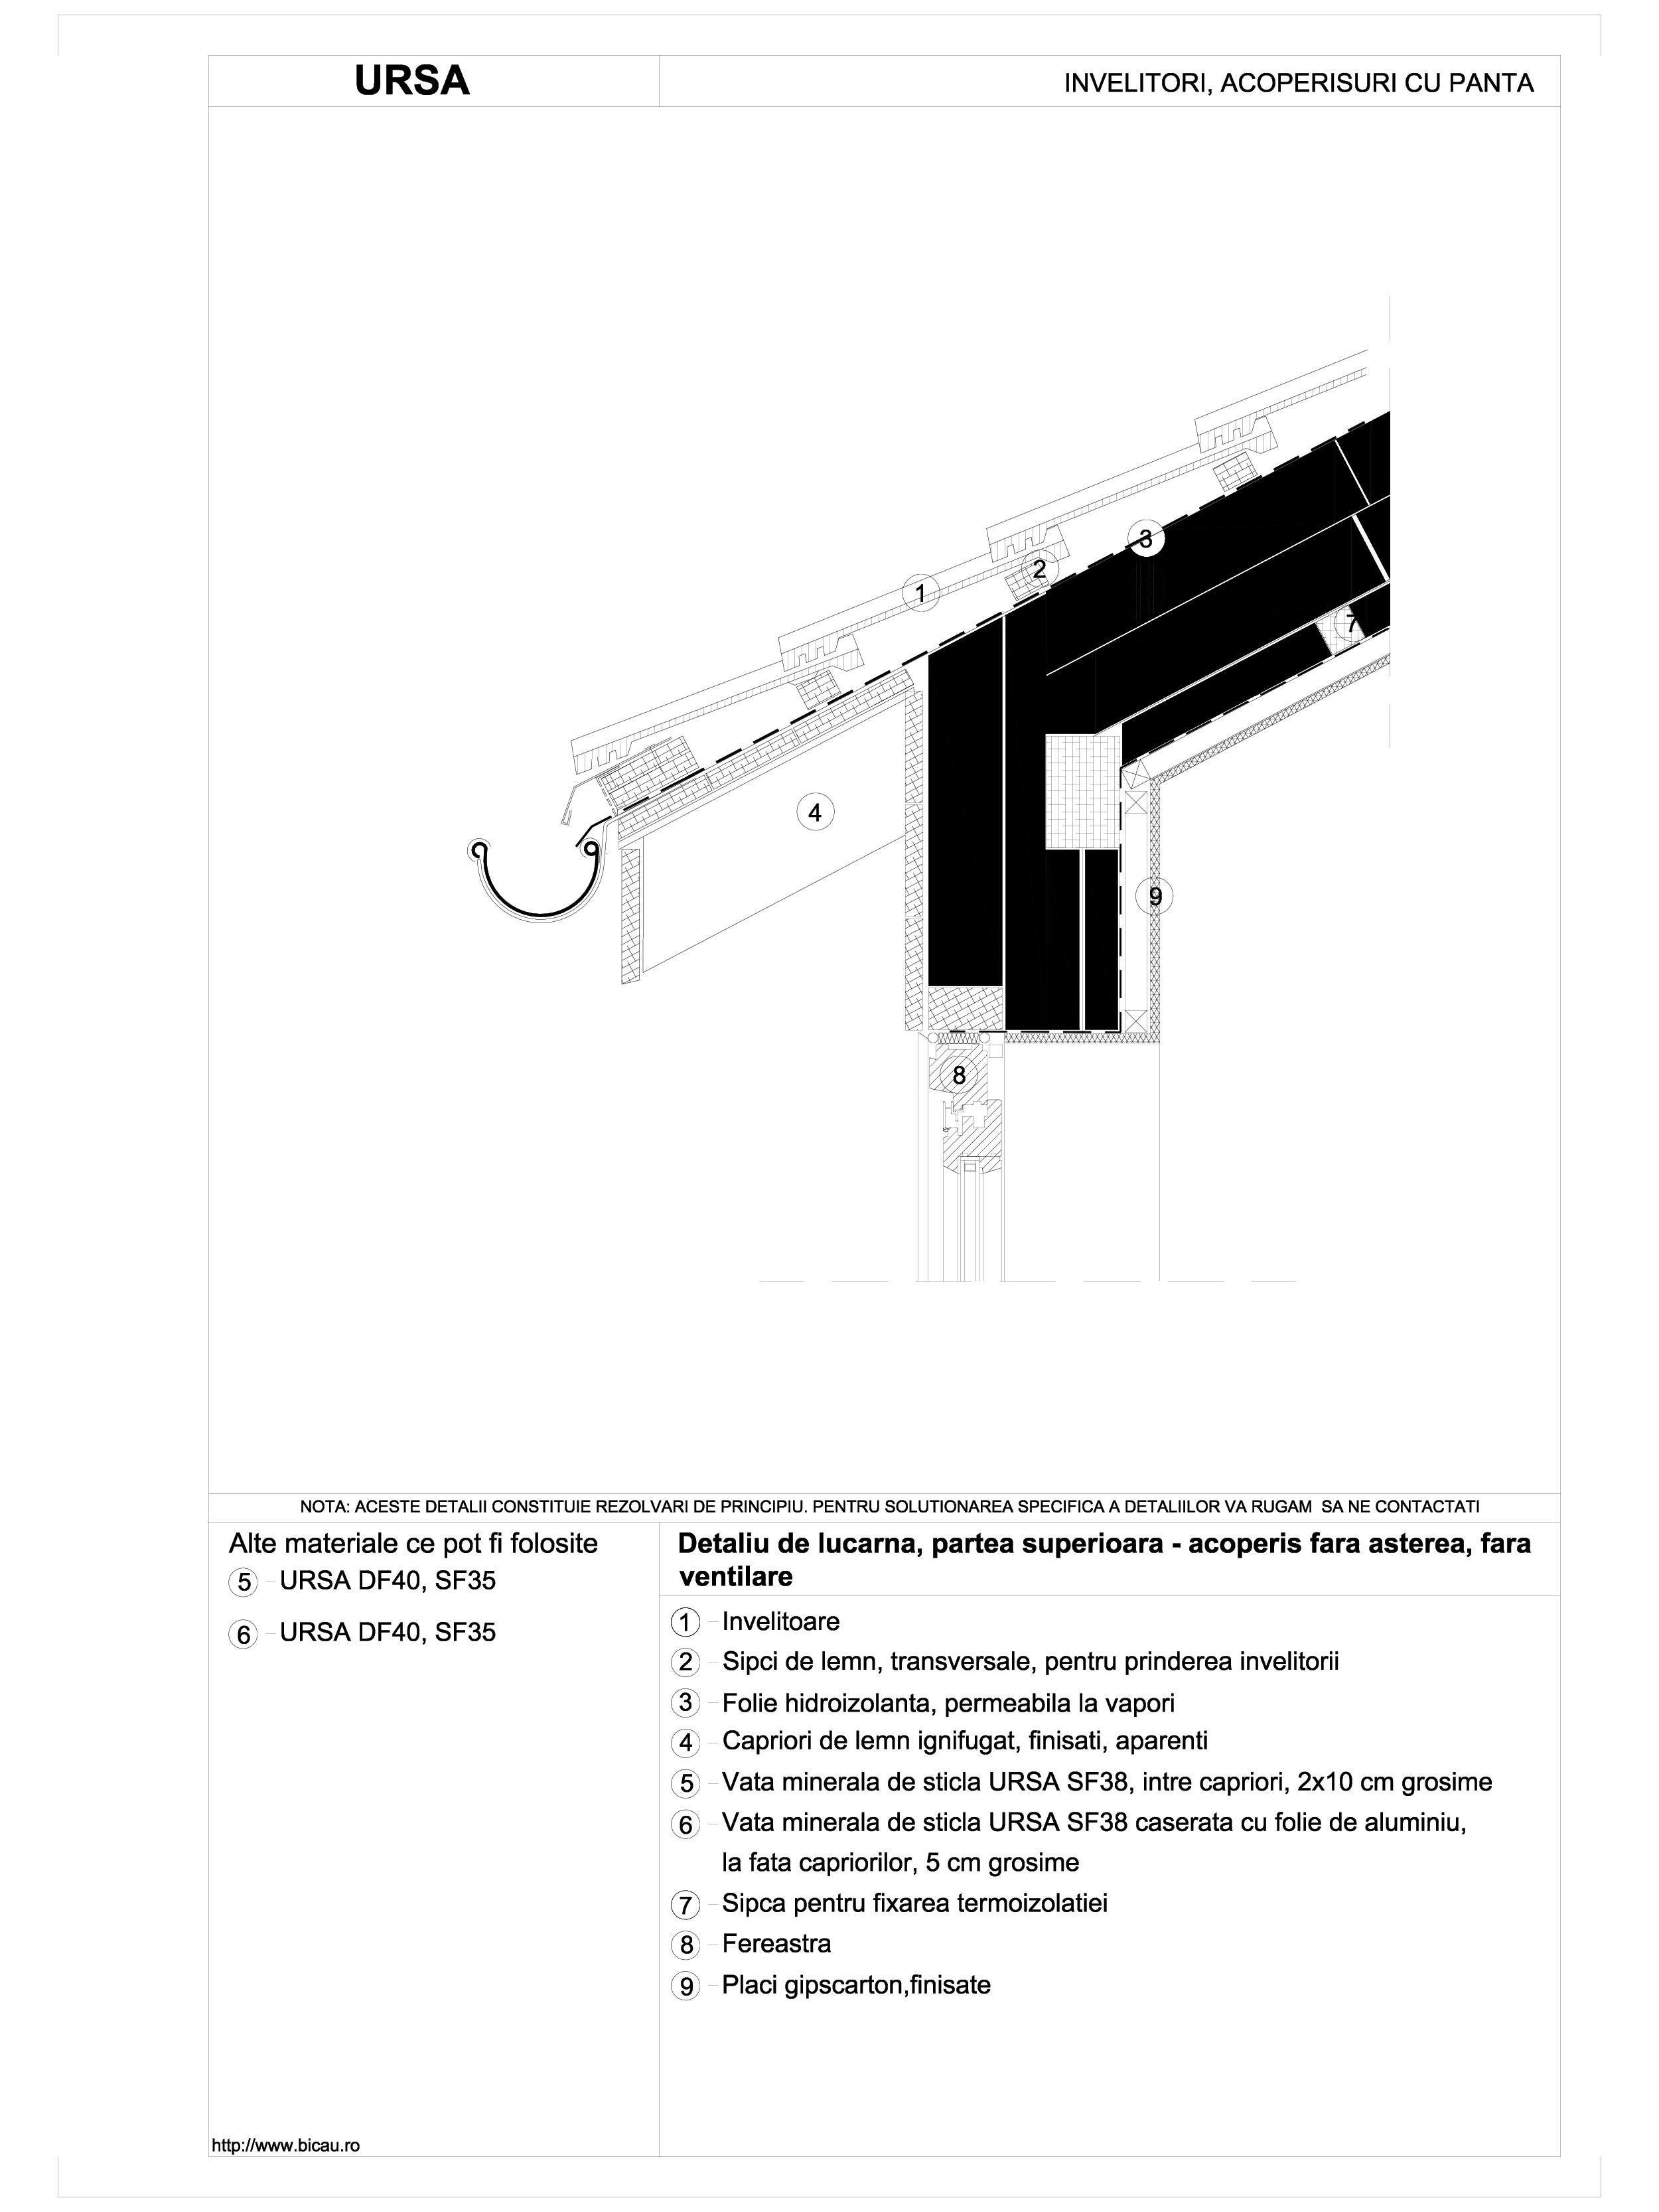 Detaliu de lucarna, partea superioara - acoperis fara asterea, fara ventilare URSA Vata minerala pentru acoperisuri si mansarde URSA ROMANIA   - Pagina 1